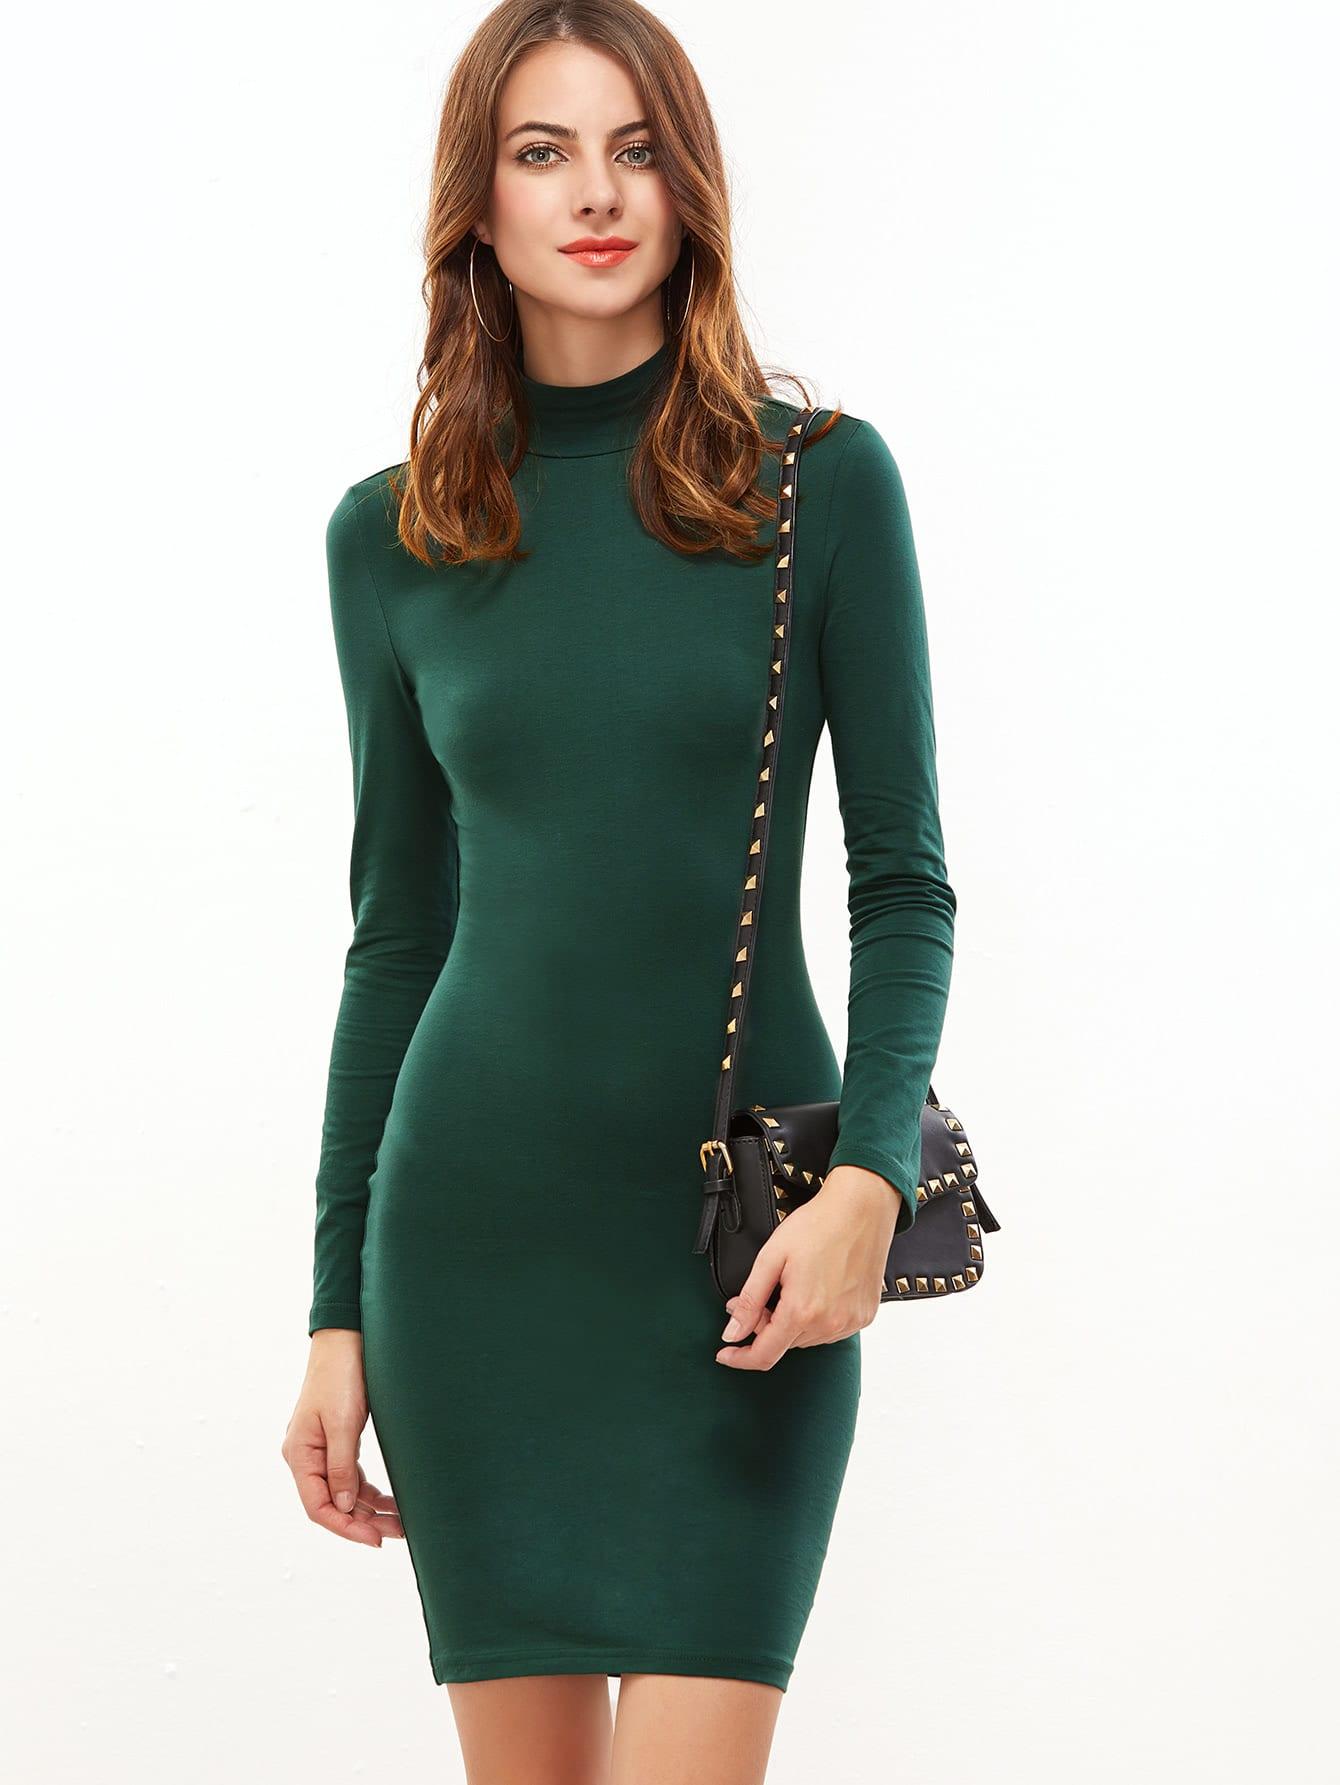 Green Mock Neck Long Sleeve Bodycon Dress